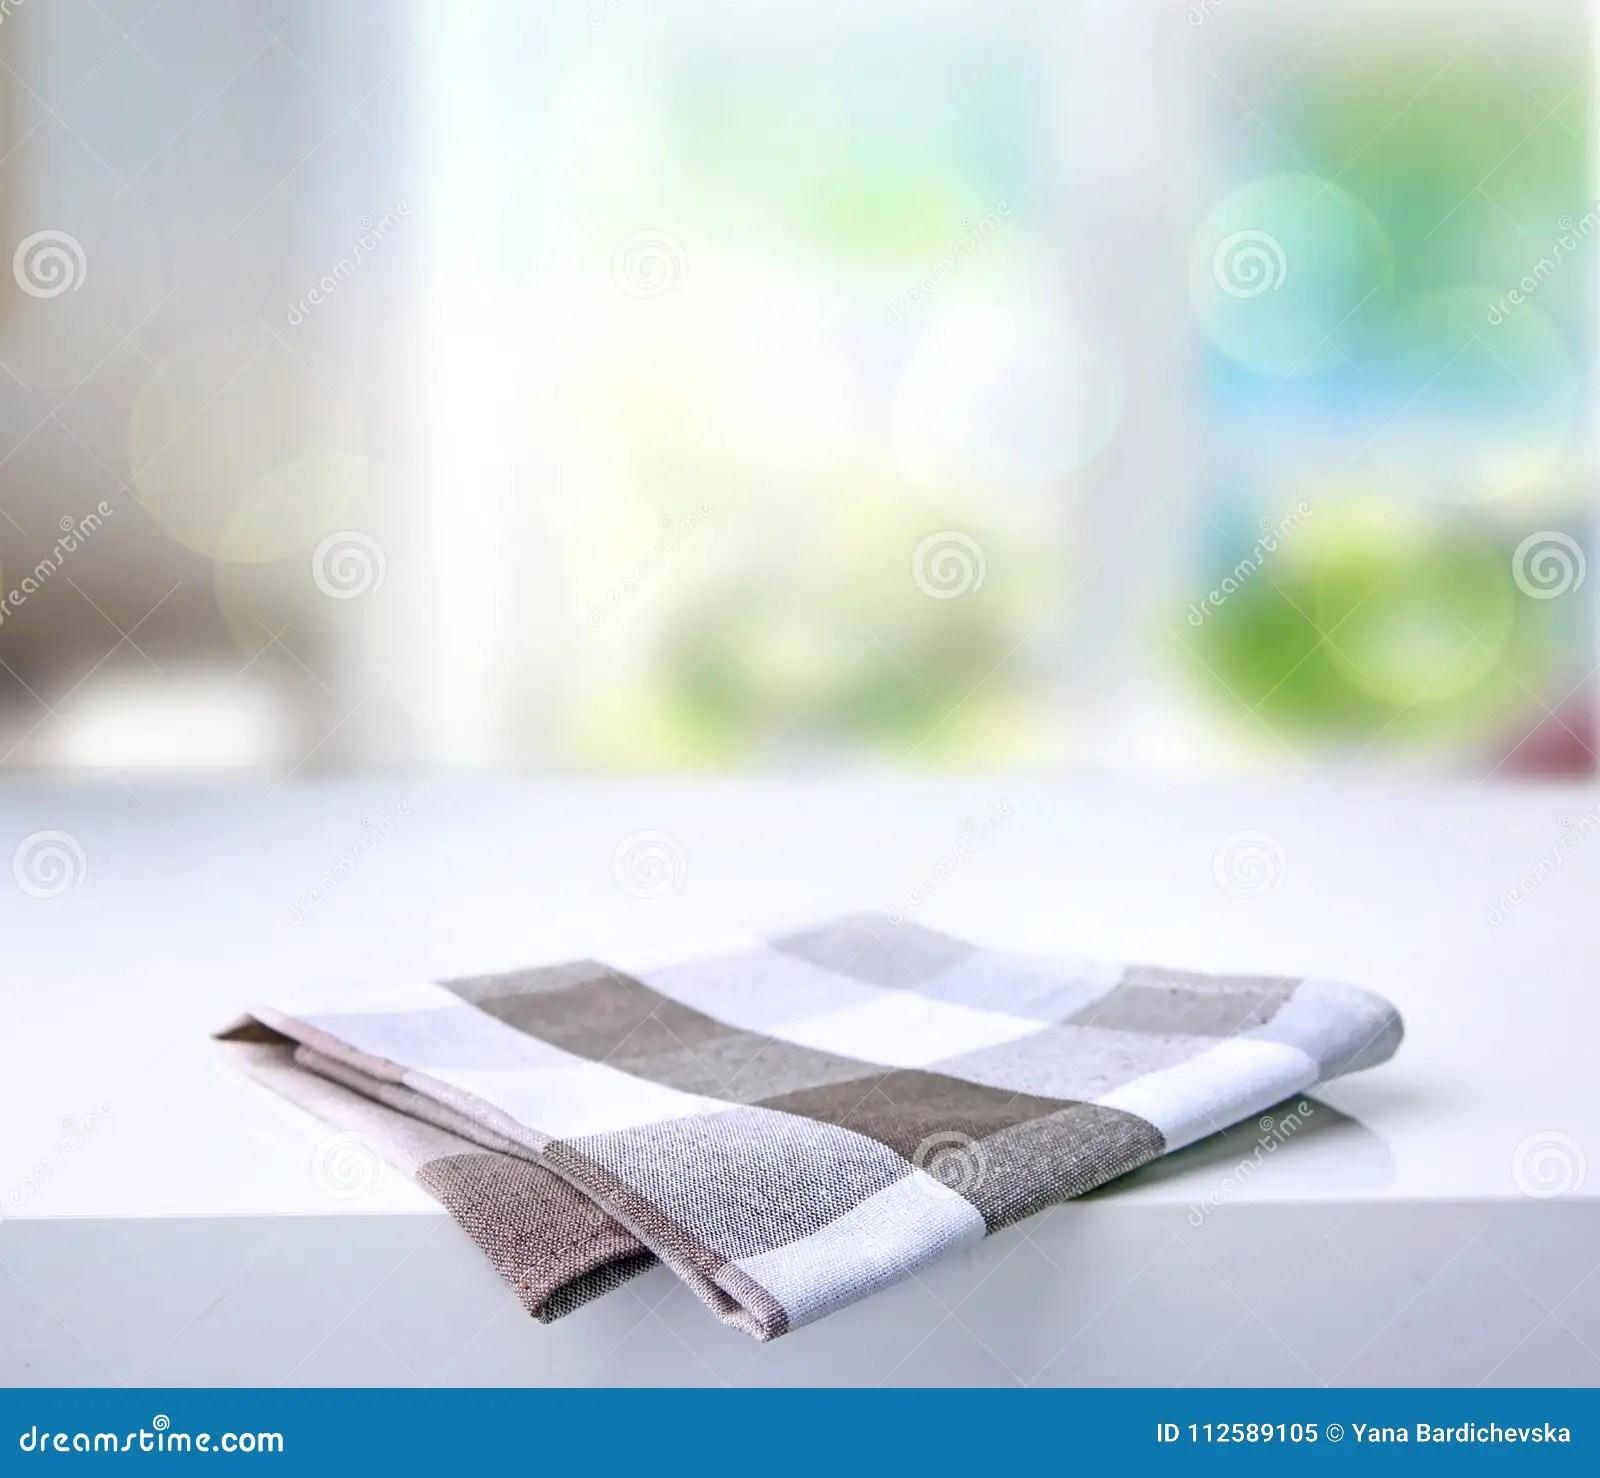 gray kitchen towels knife set 在桌上的被折叠的厨房方格的毛巾库存图片 图片包括有餐巾 模式 靠山 在桌上的被折叠的厨房方格的毛巾